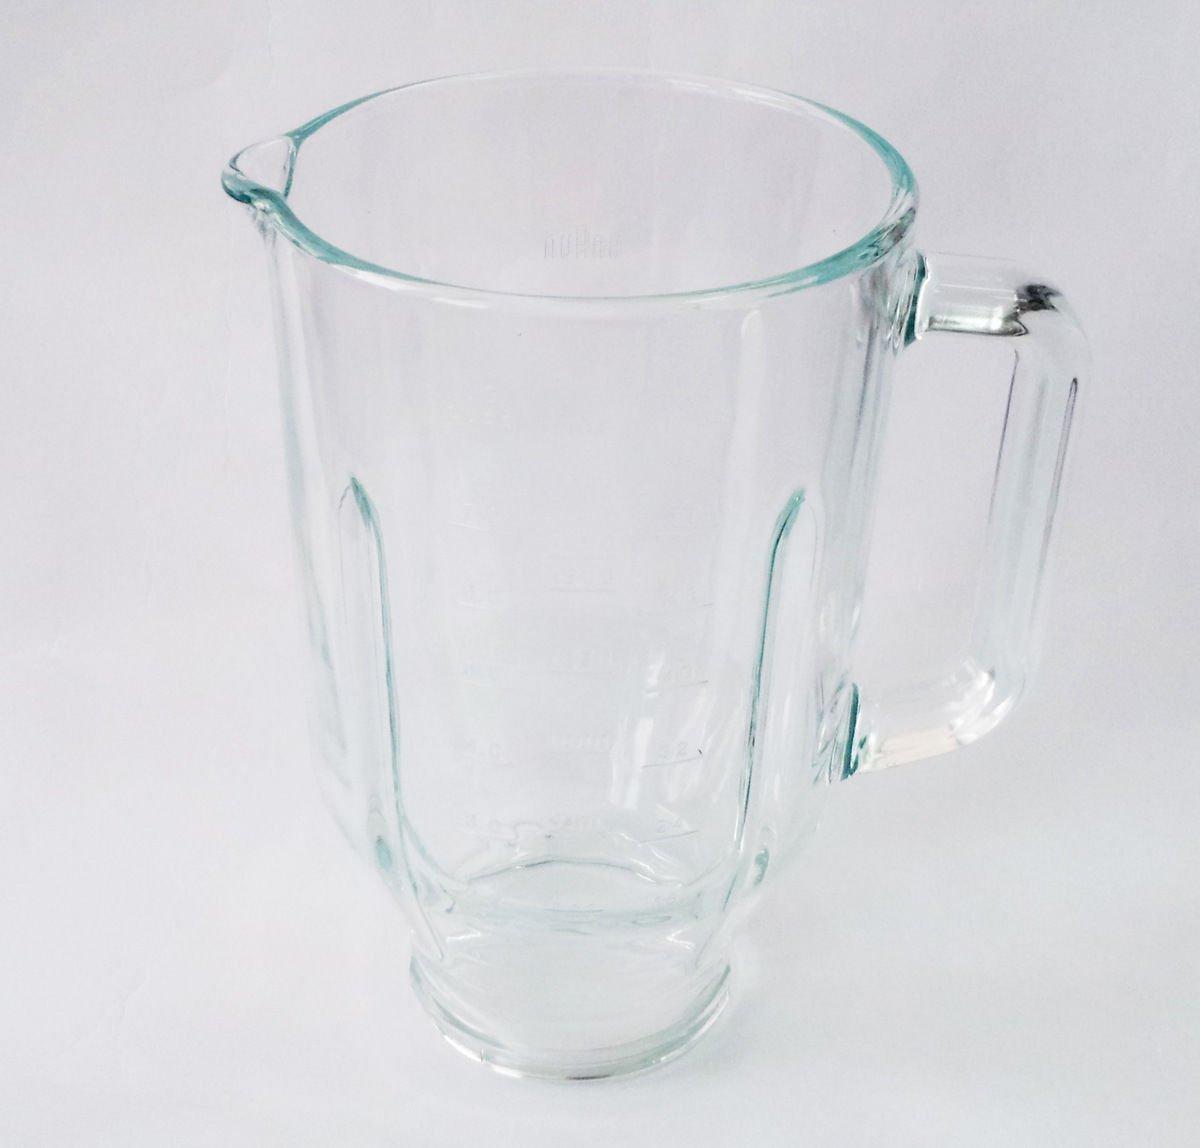 Braun - Vaso jarra batidora 4125, 4126, 4145, JB50, JB51, JB7, JB71, JB: Amazon.es: Hogar